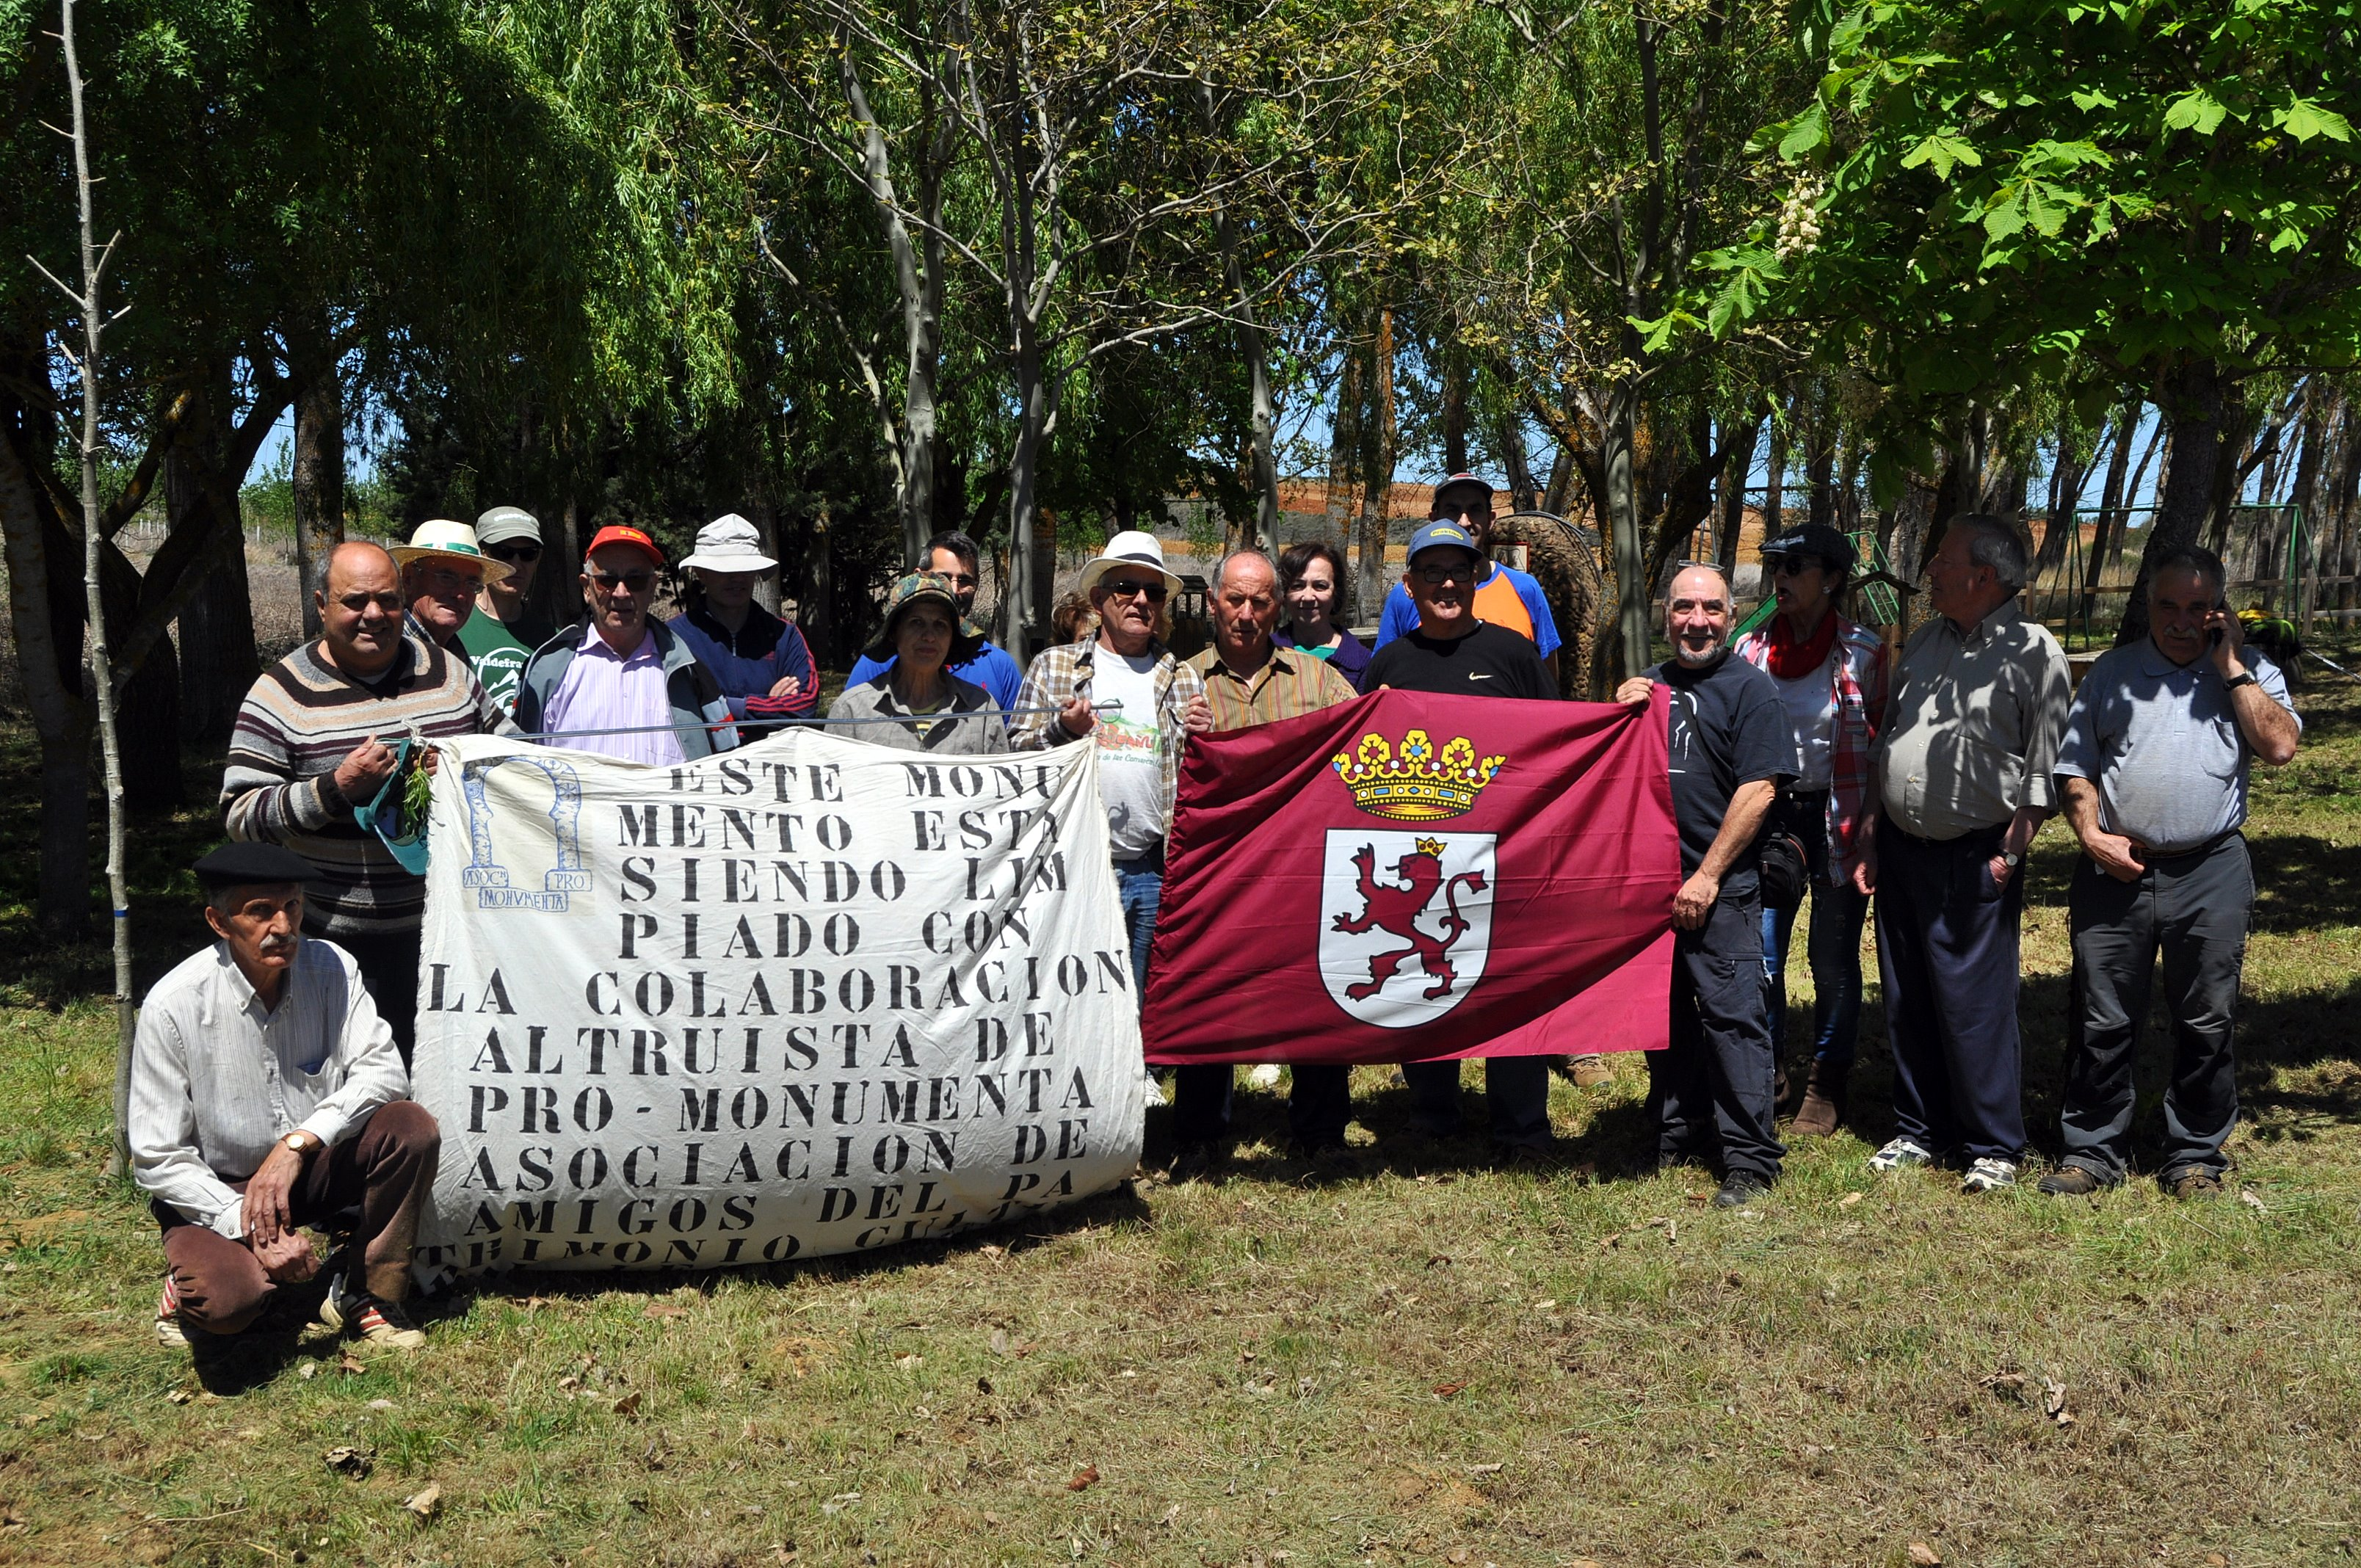 El grupo de Promonumenta.